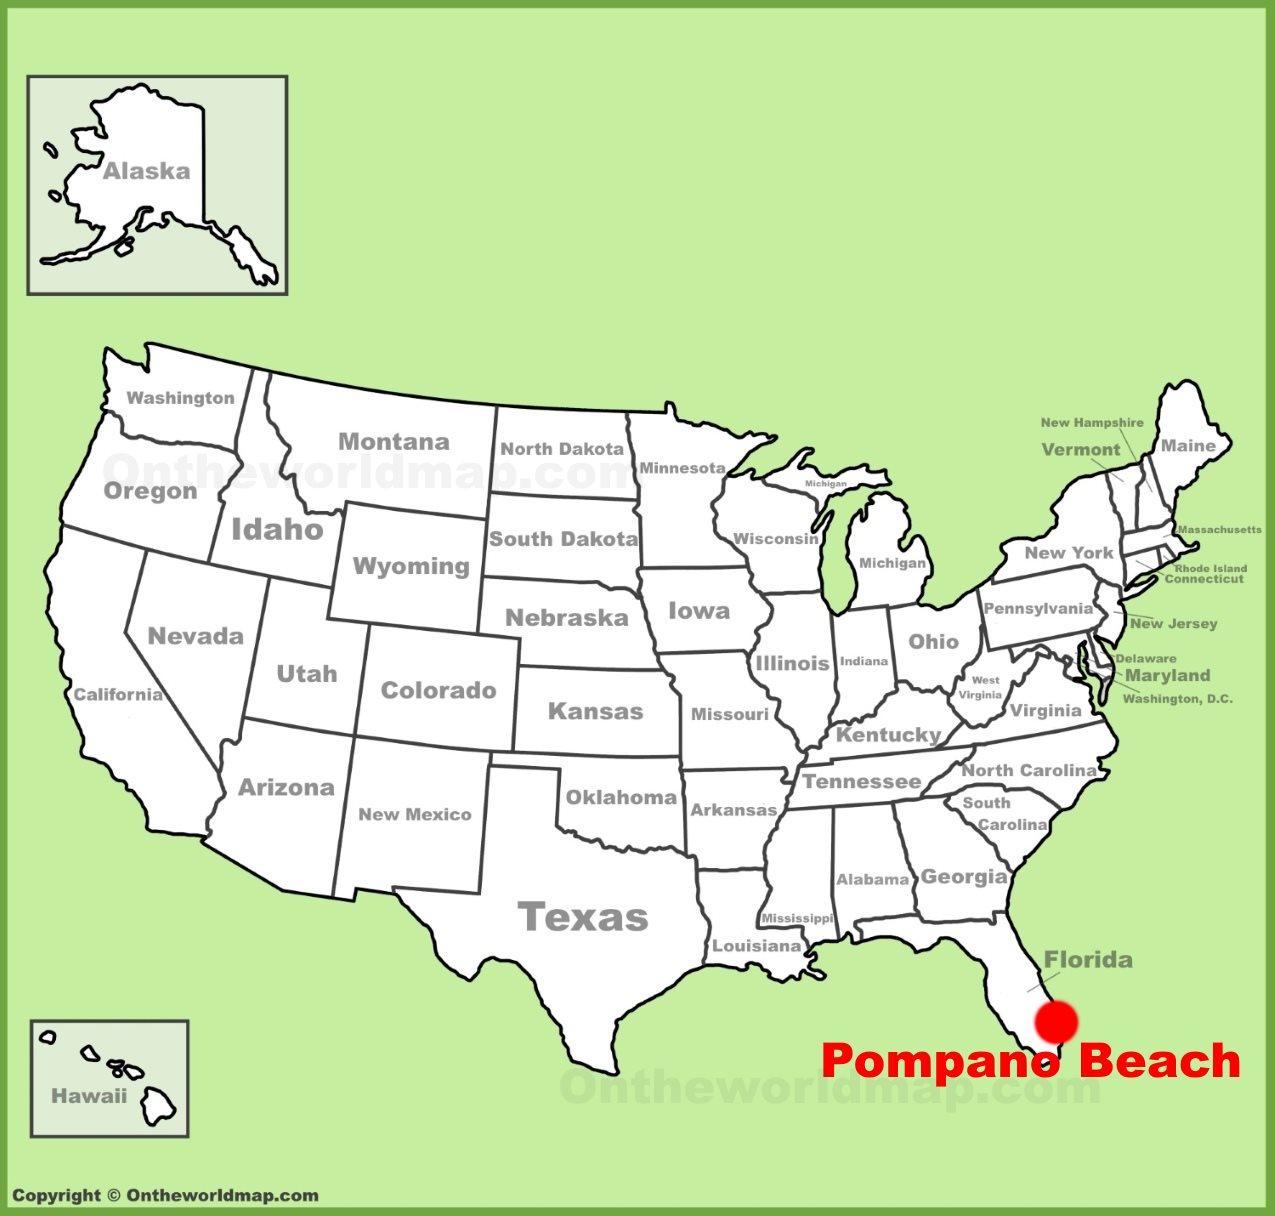 Pompano Beach Map Of Florida.Pompano Beach Location On The U S Map